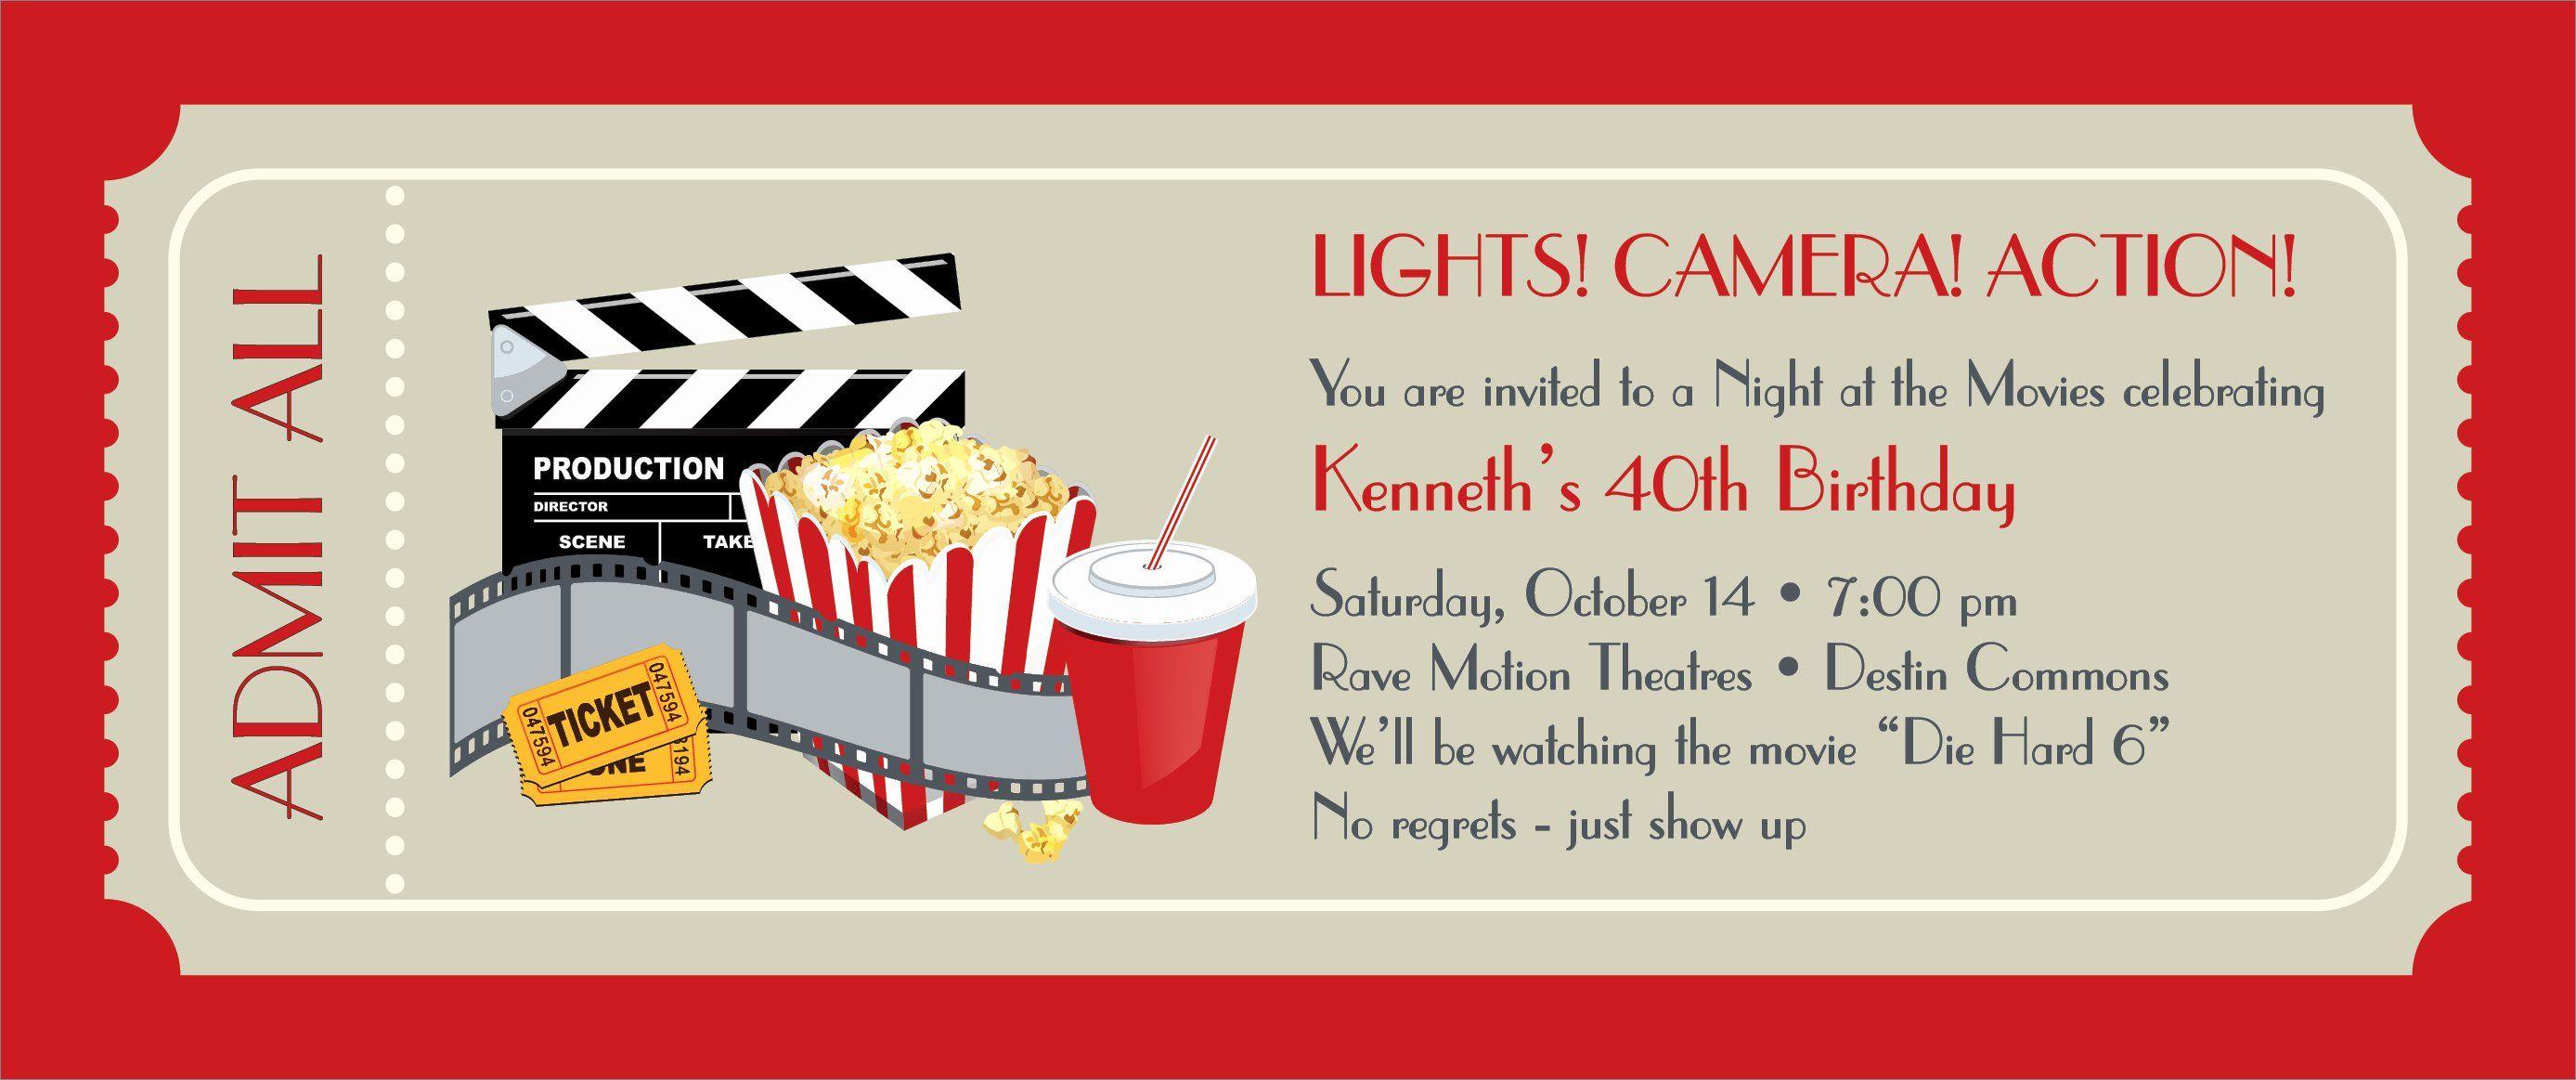 Movie Ticket Invitation Template Free Inspirational Movie Ticket Template Movie Party Invitations Movie Ticket Invitations Movie Night Invitations